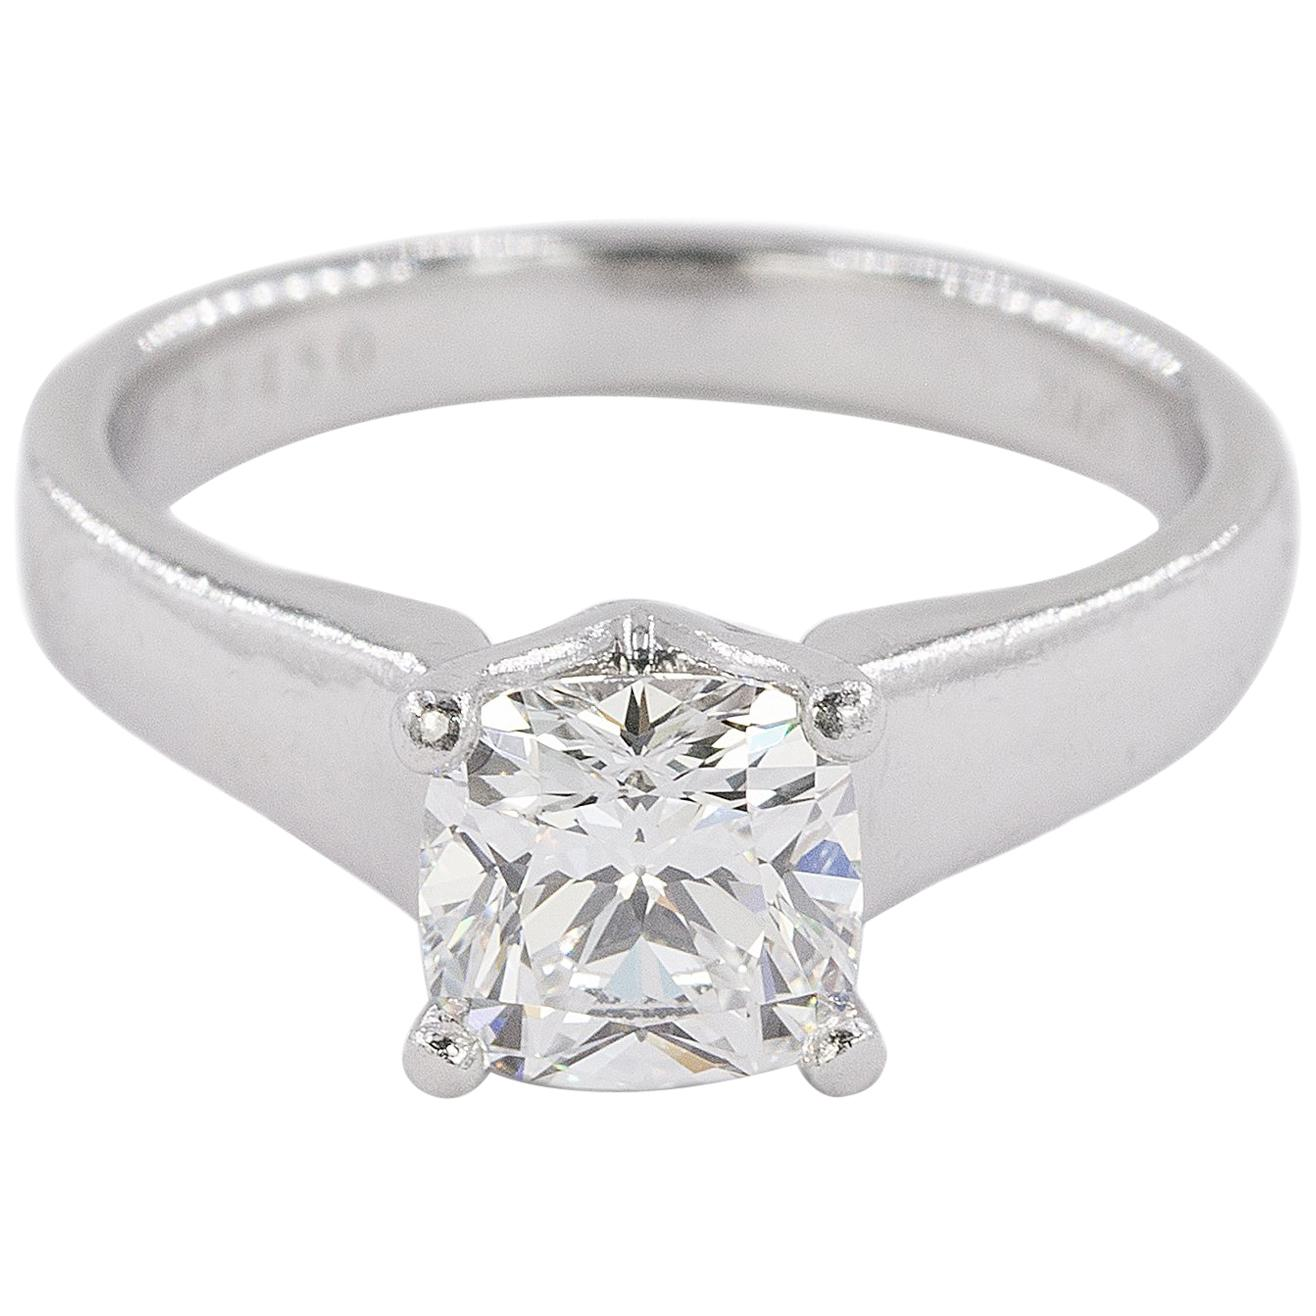 Platinum Ring with E Color VVS1 Clarity Cushion Cut Diamond